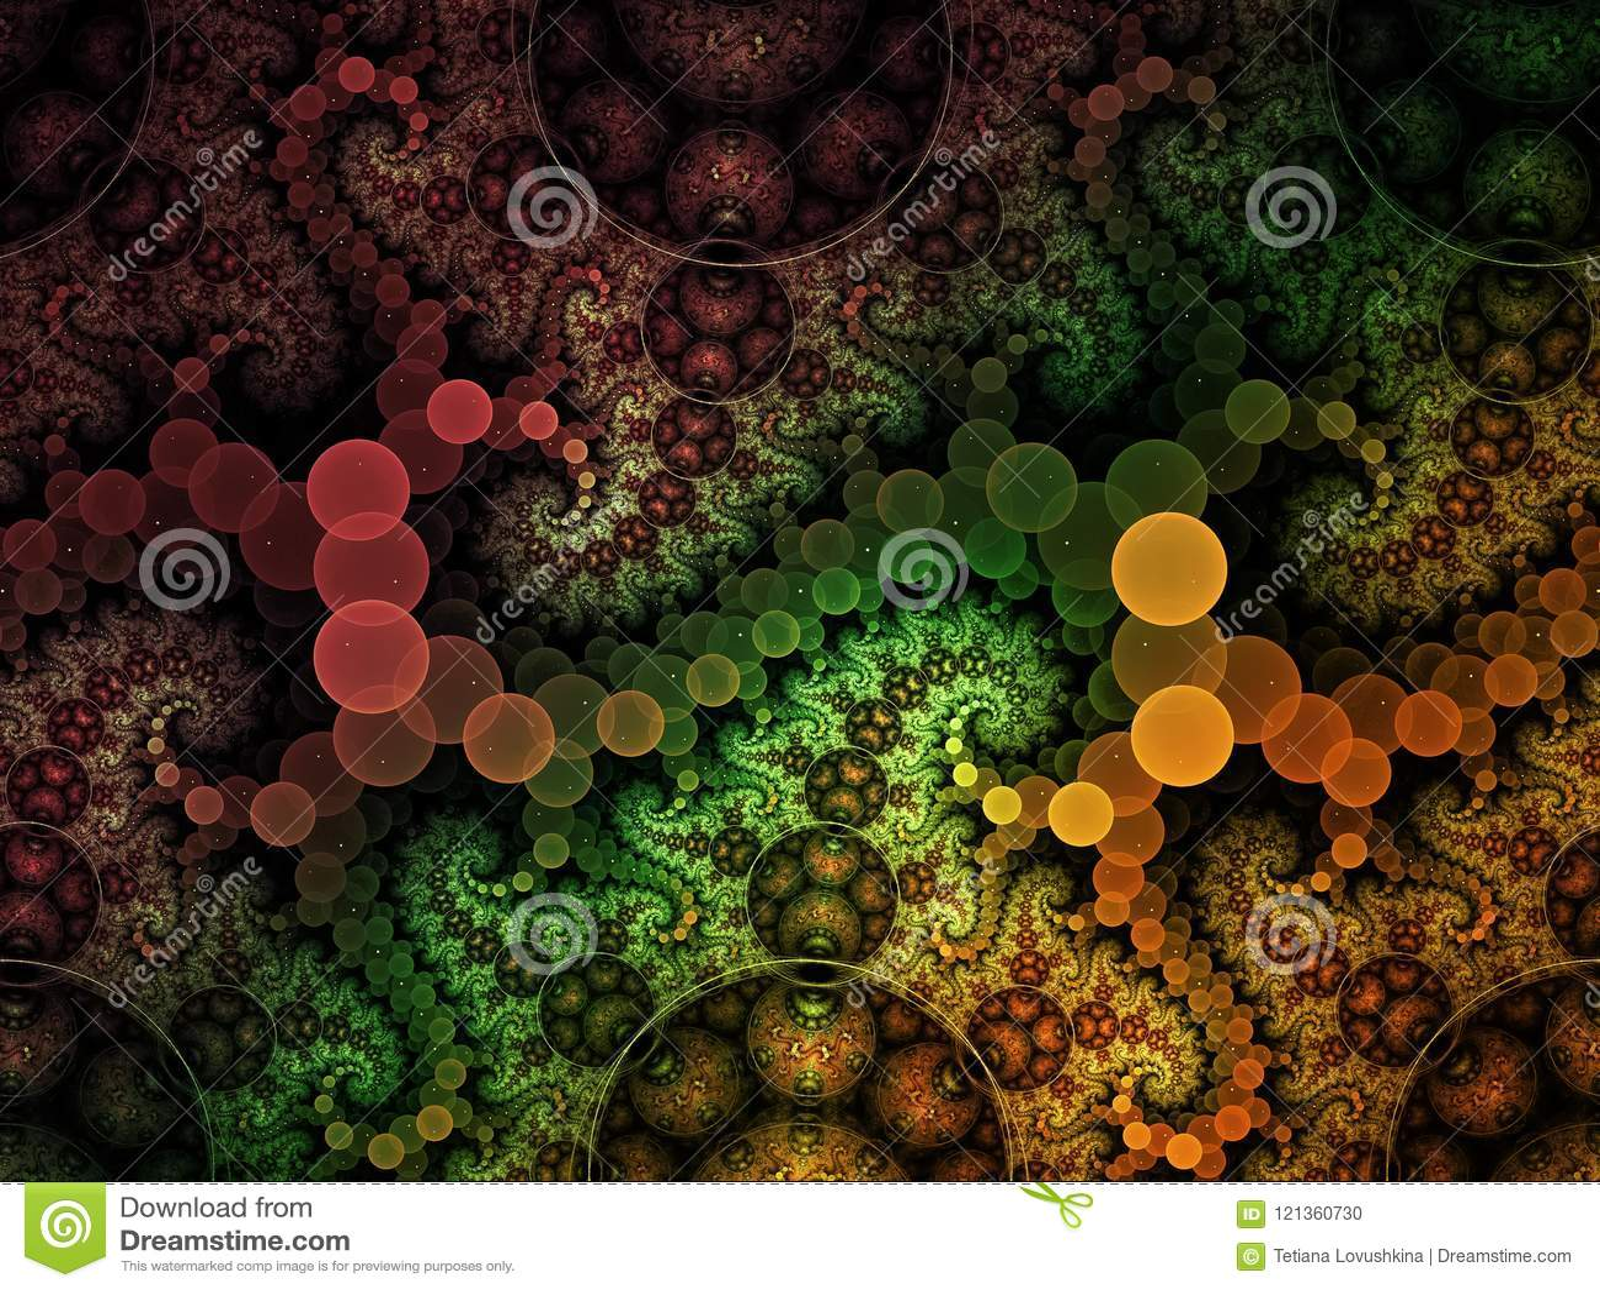 Fractal αφηρημένος υπερφυσικός σπειροειδής λεπτός κύστεων μπουκλών σχεδίων παράγει artisticbubble